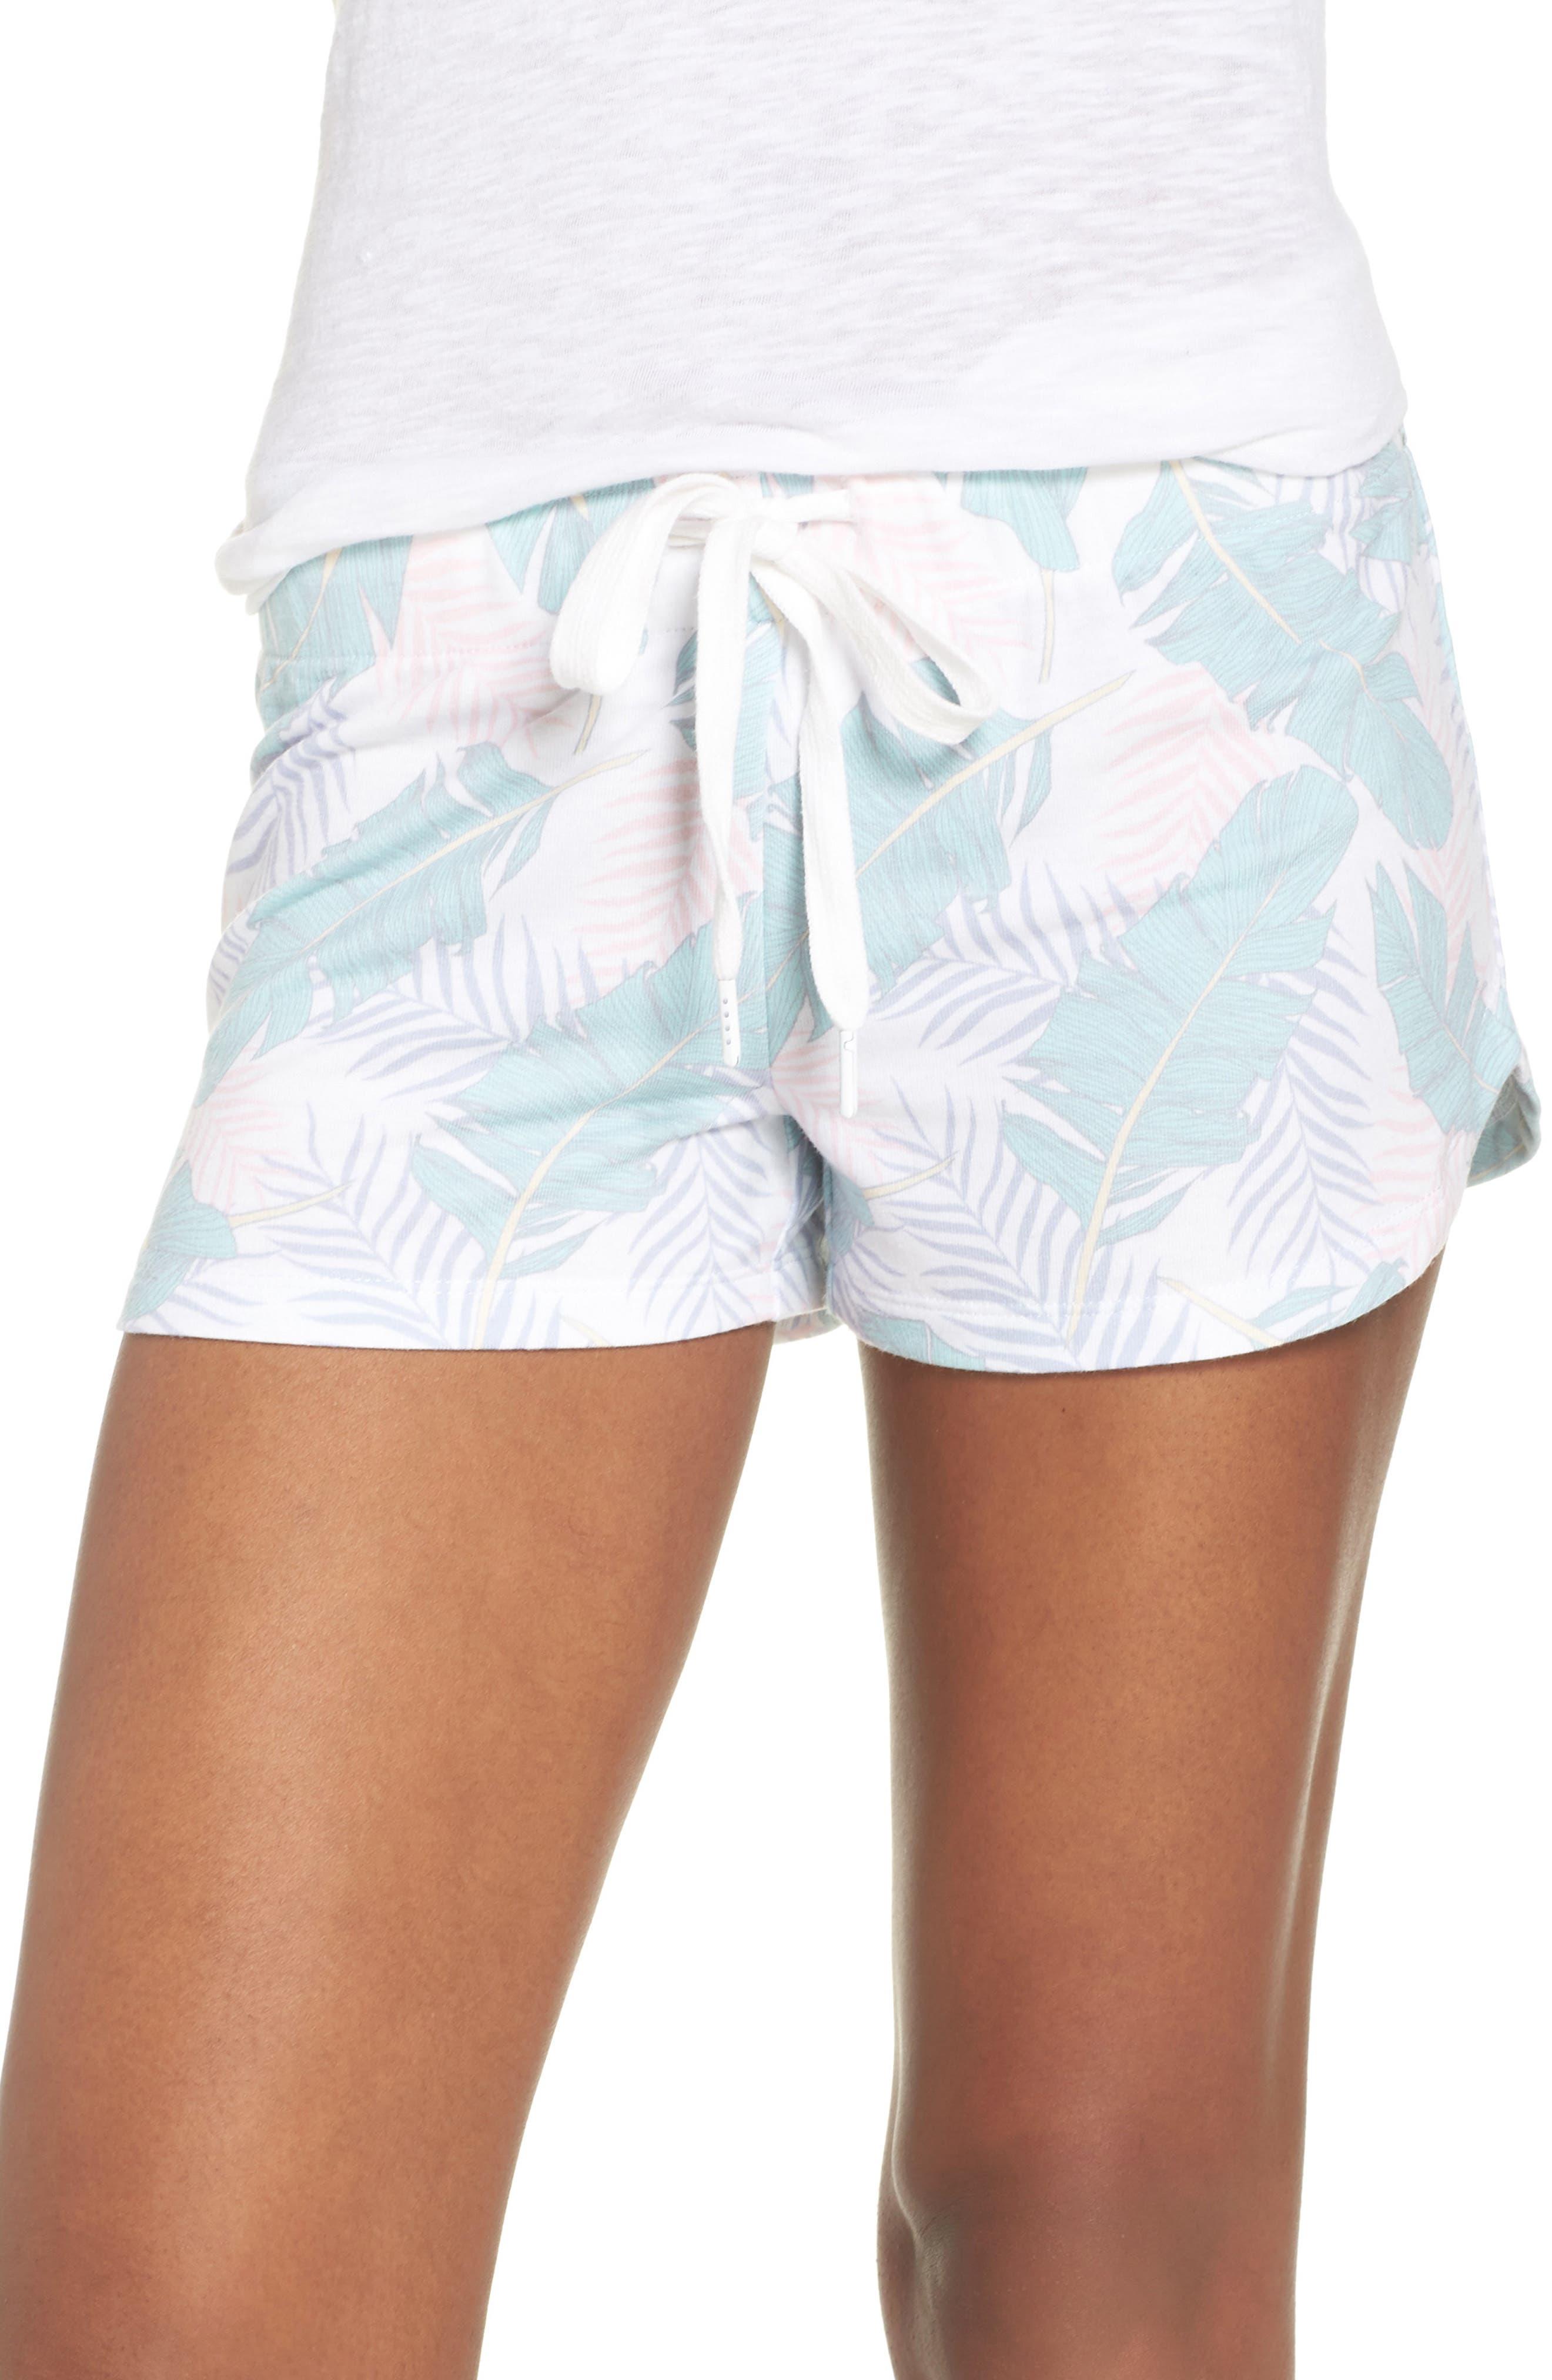 Lounge Shorts,                         Main,                         color, White